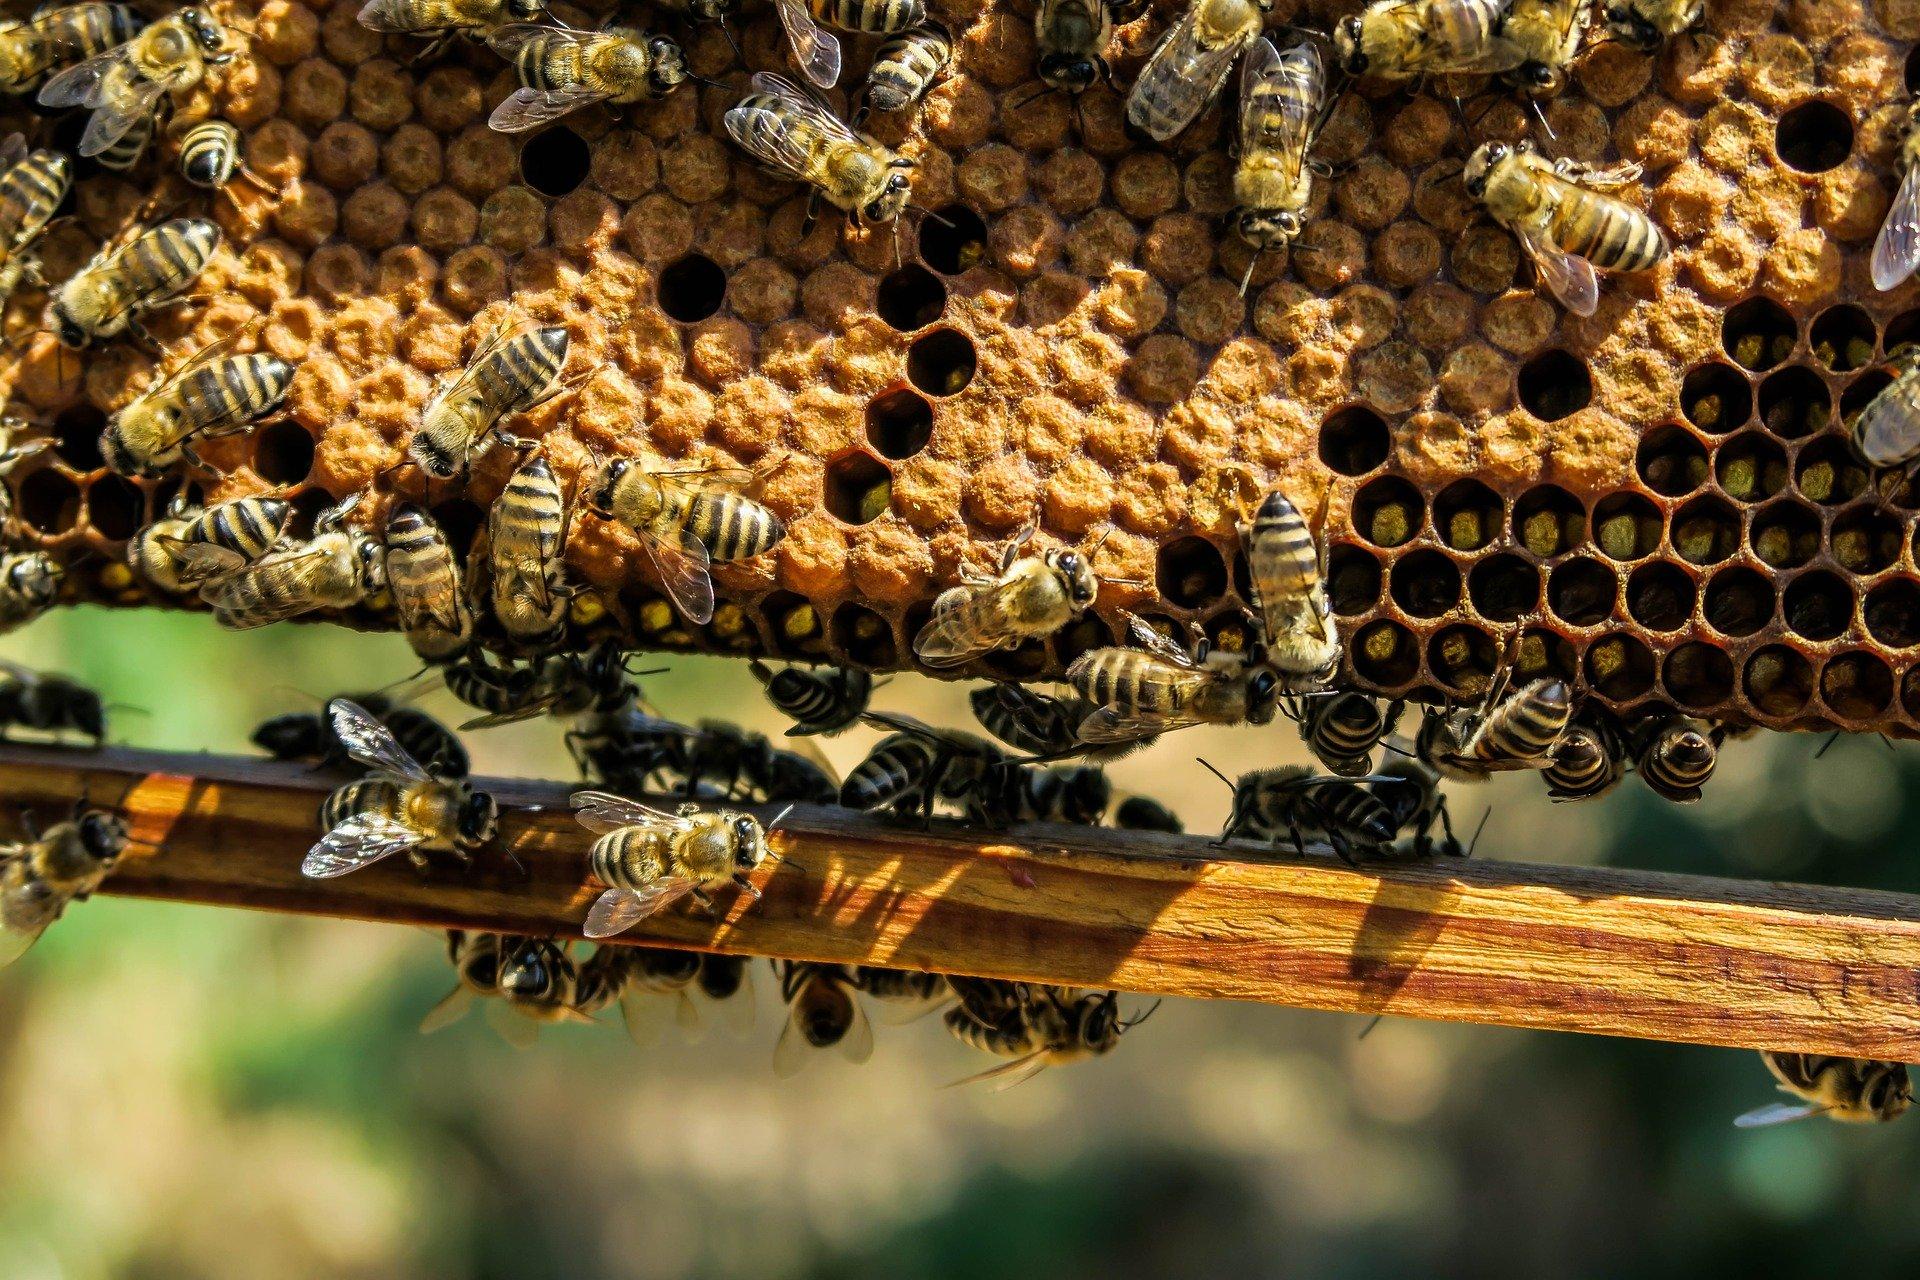 In Francia api a rischio per la reintroduzione di alcuni pesticidi